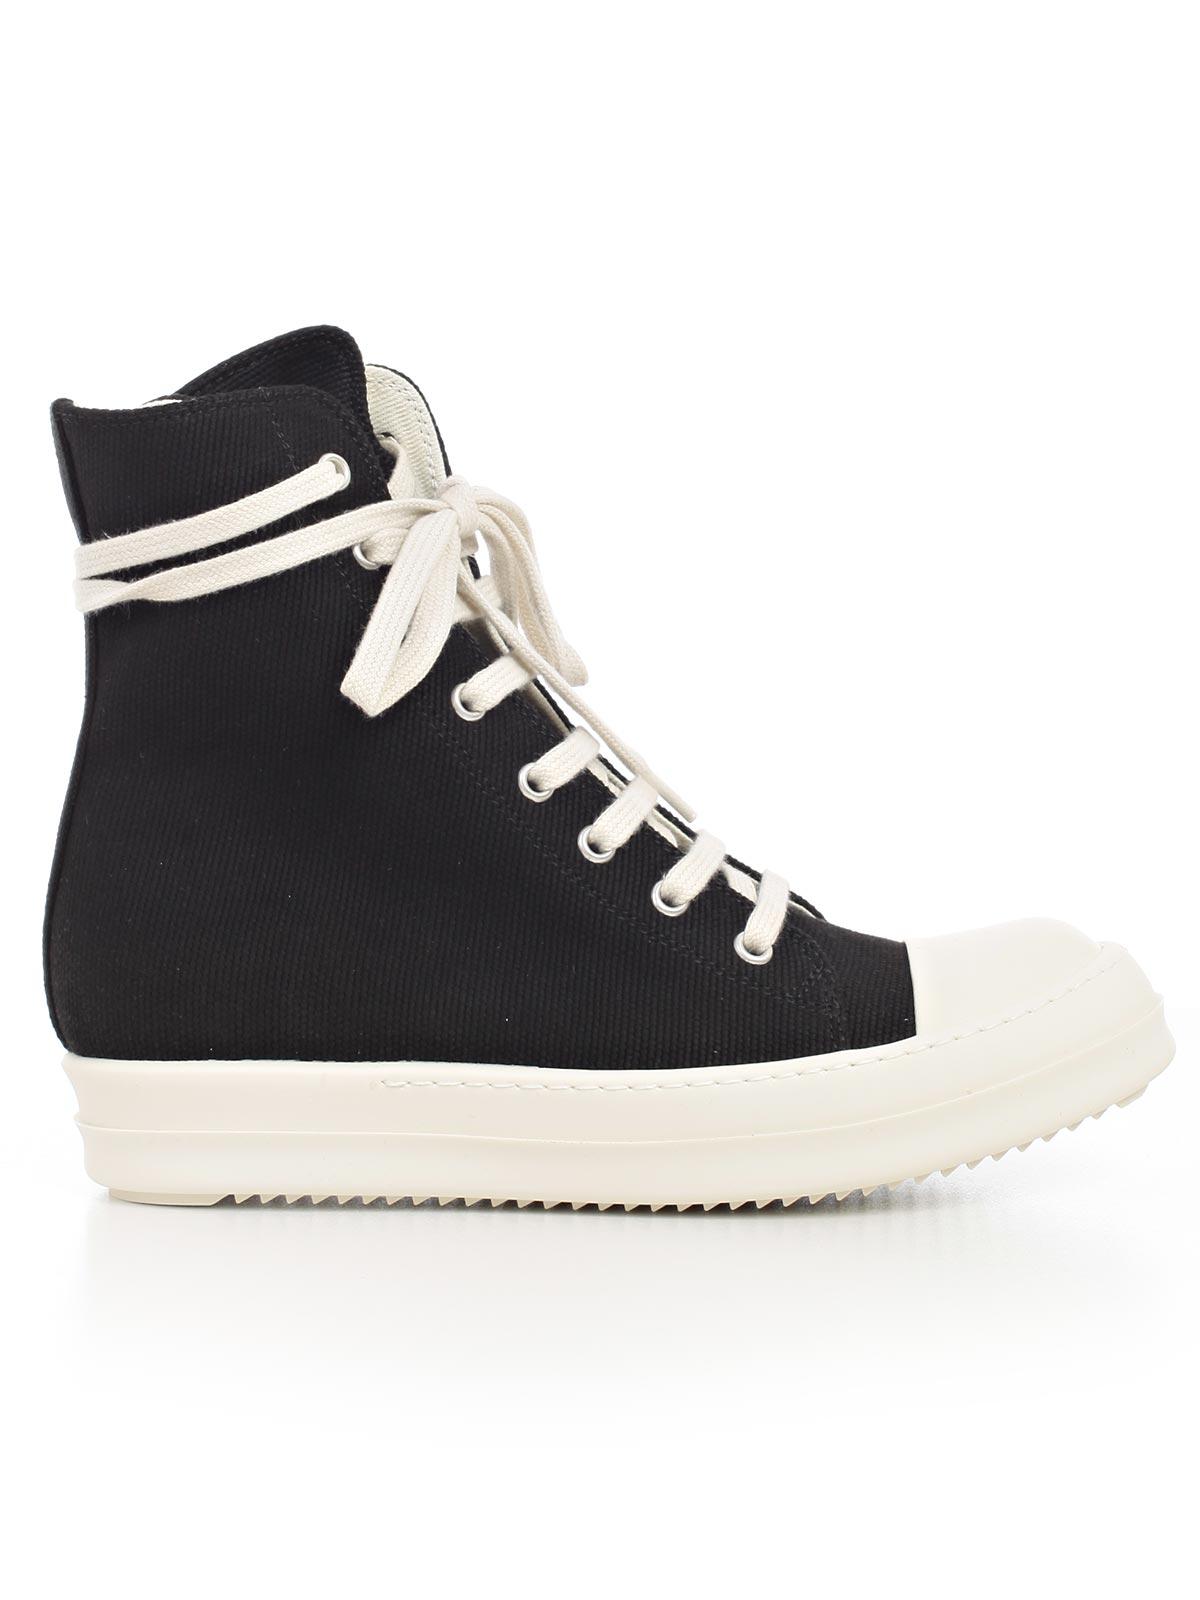 Rick Owens Drkshdw Footwear DS17F2800